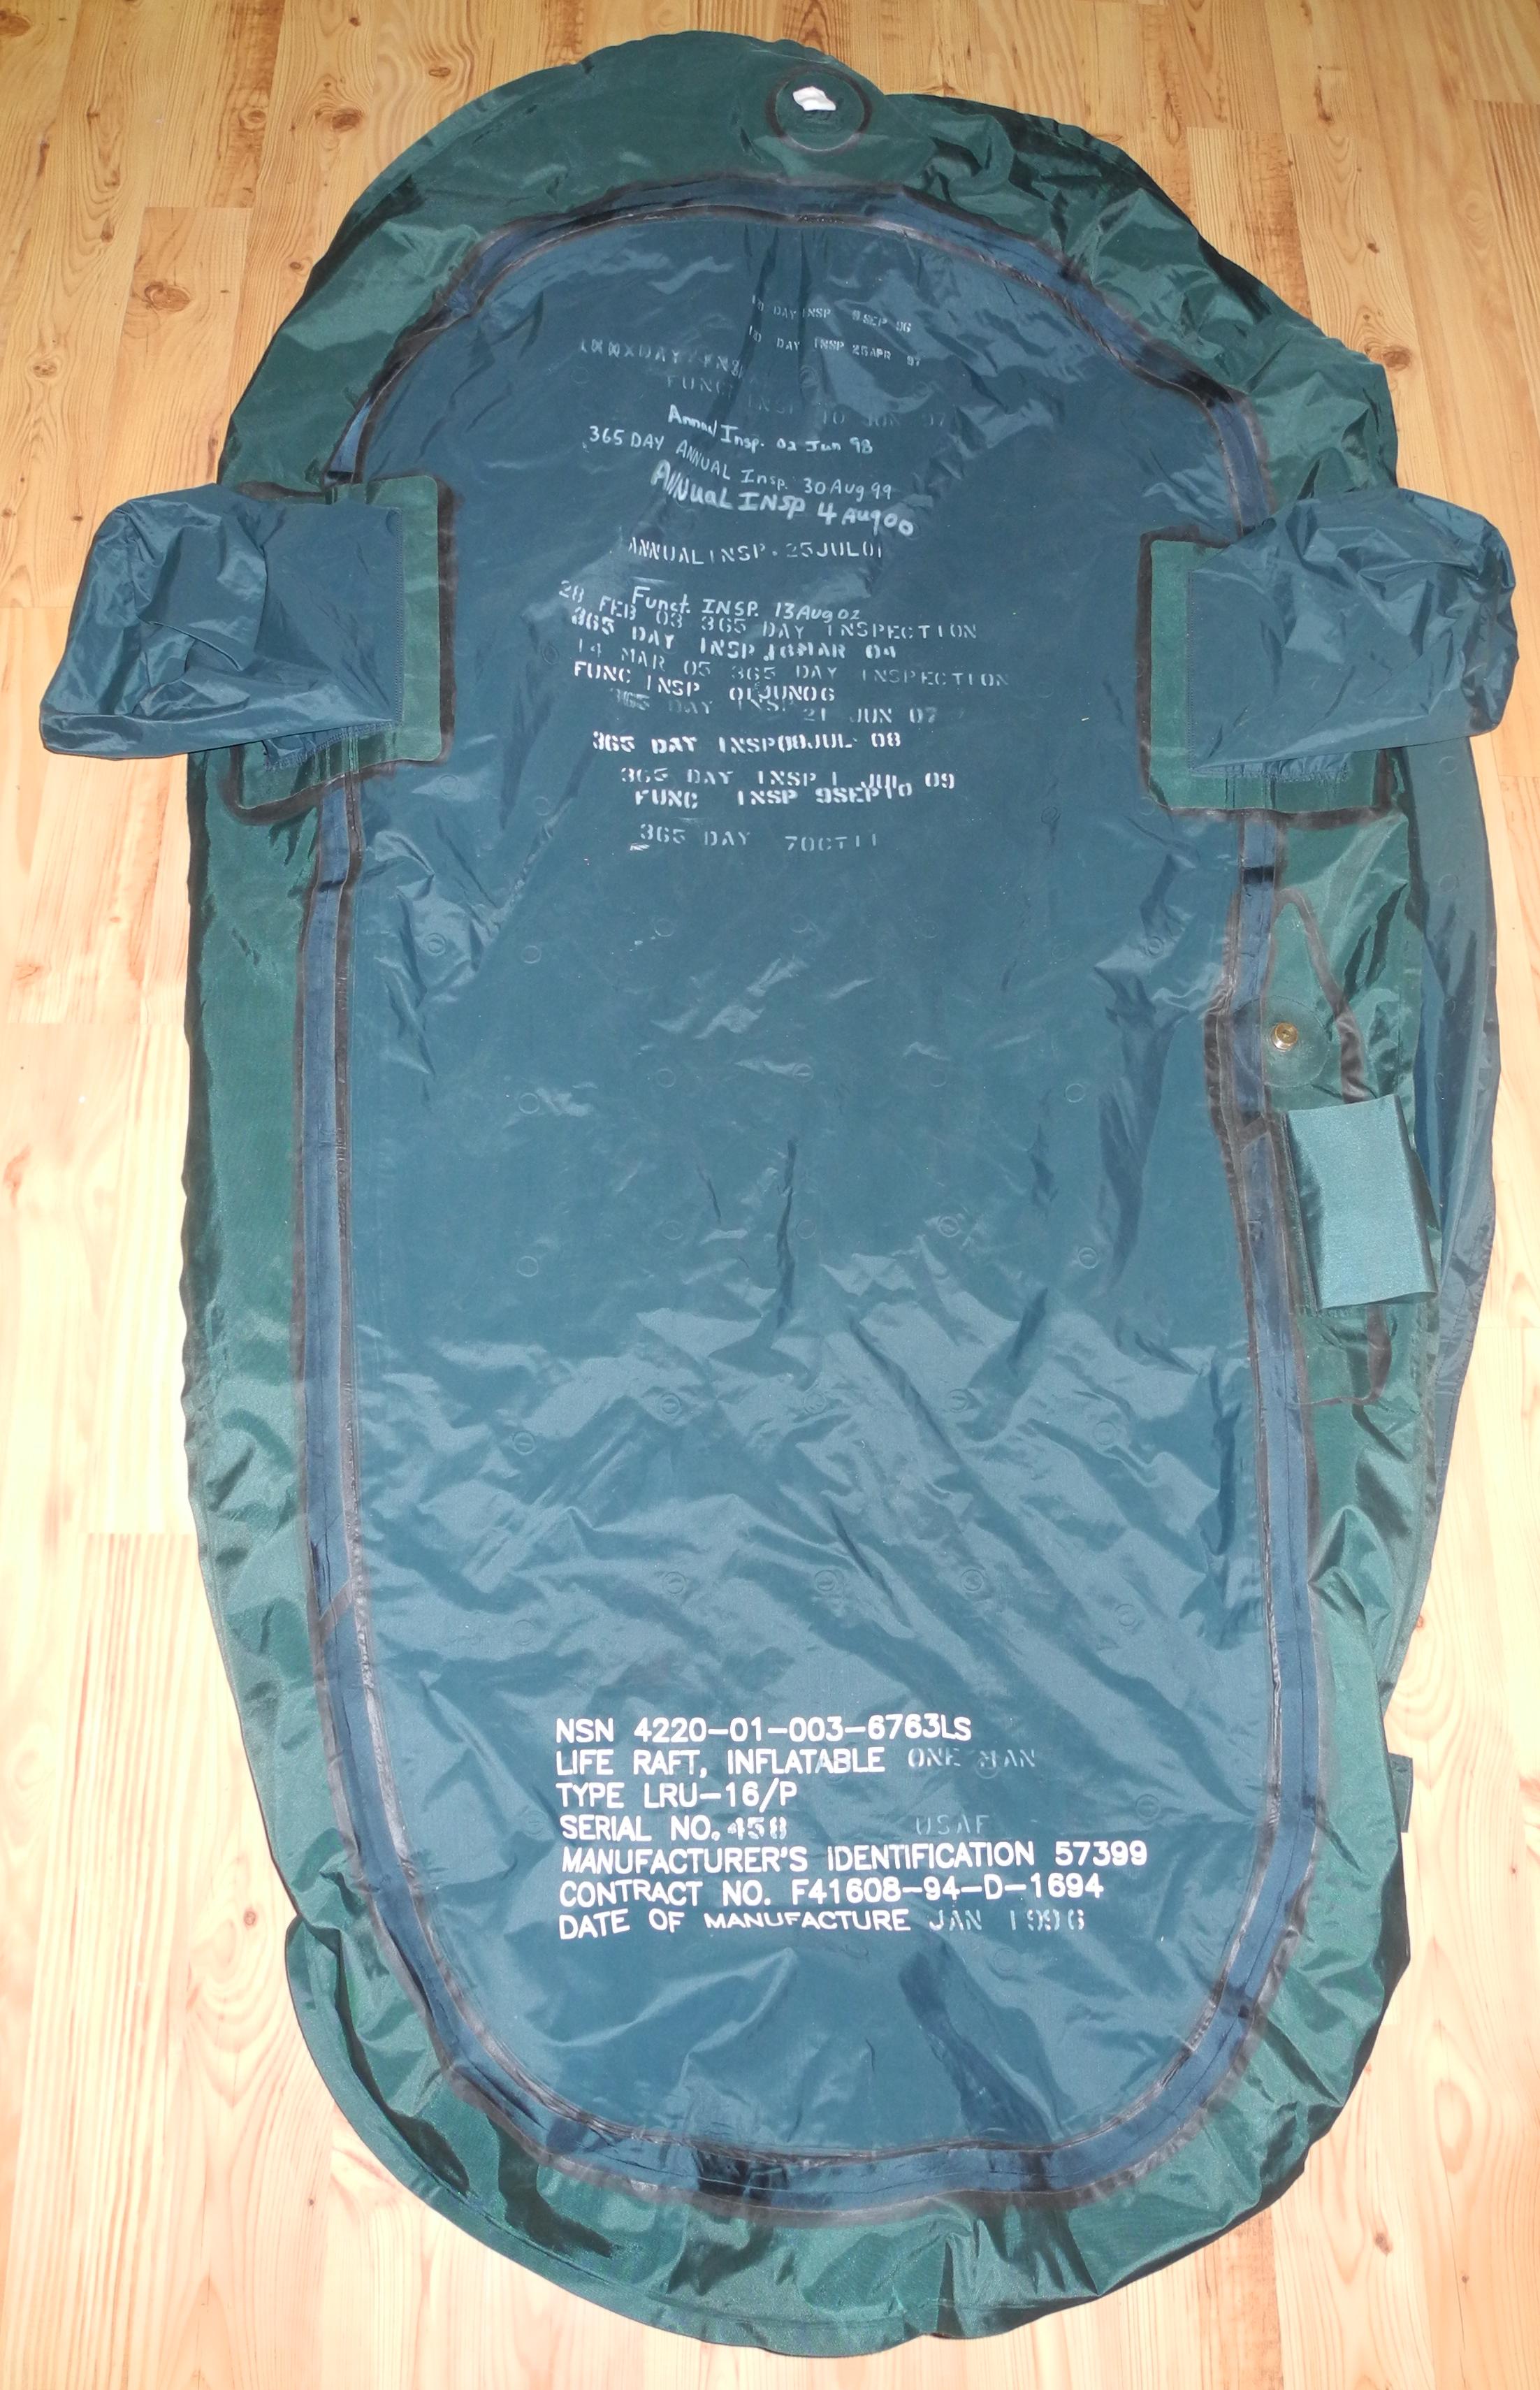 USAF LRU/16P life raft for F-16